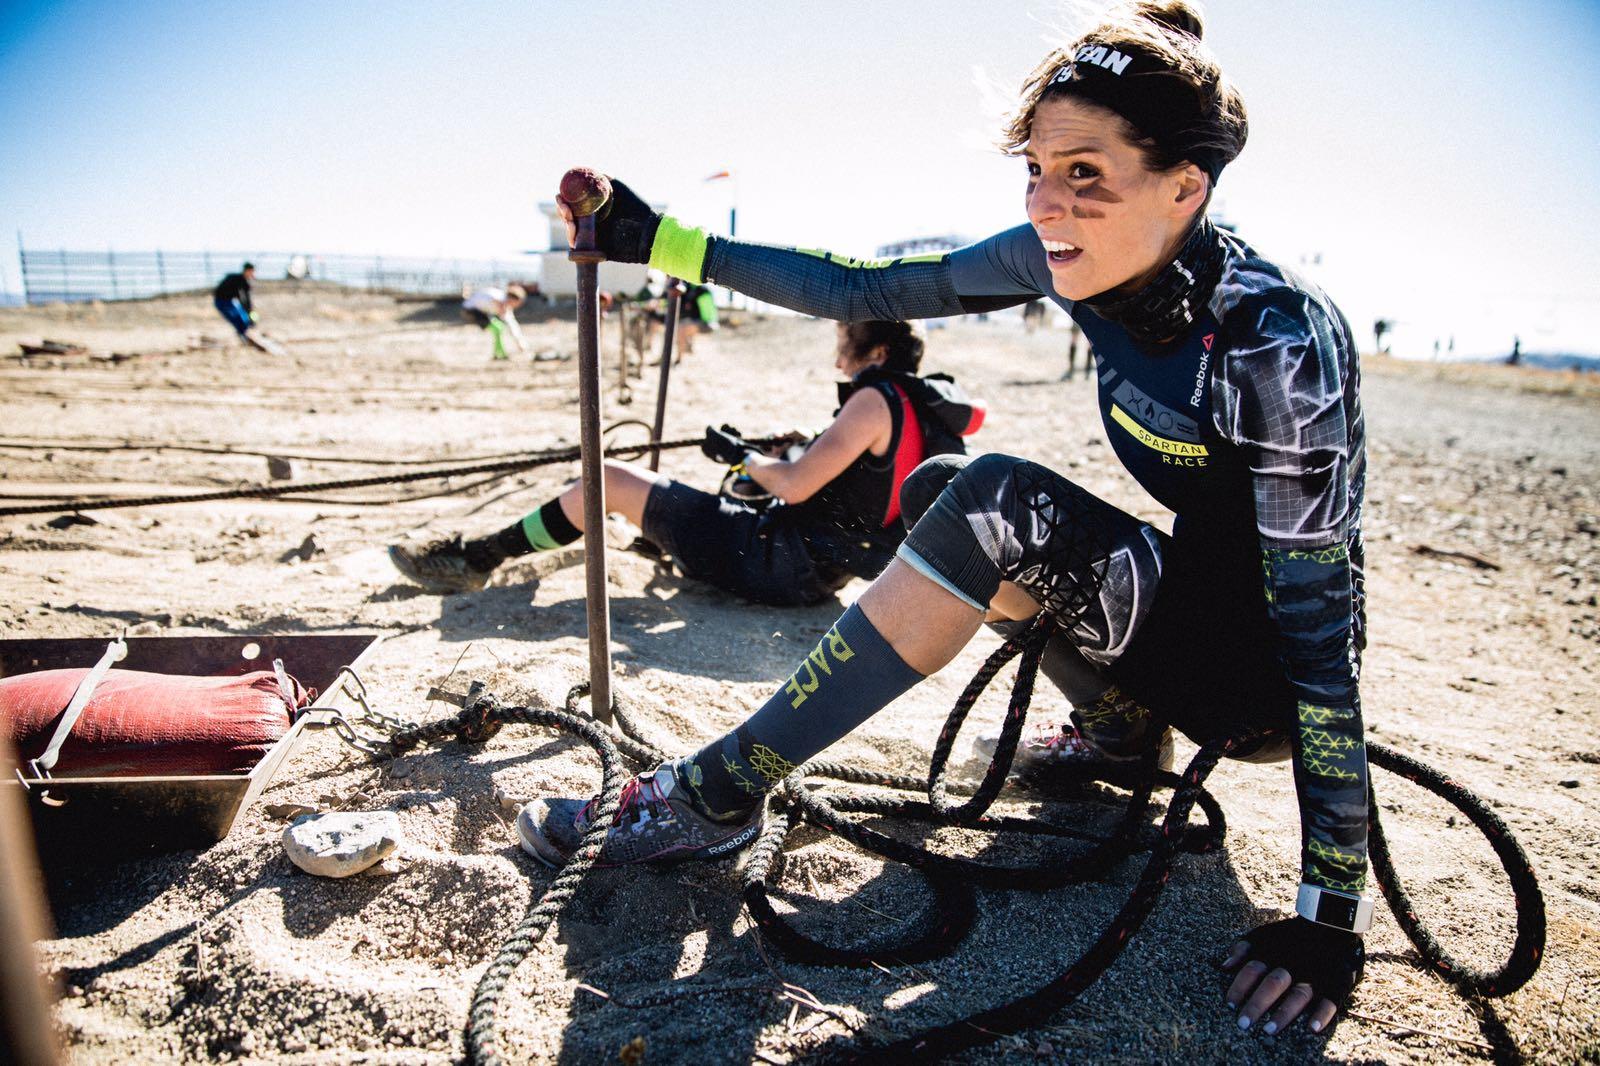 laury-thilleman-lake-tahoe-spartan-race-011016-01